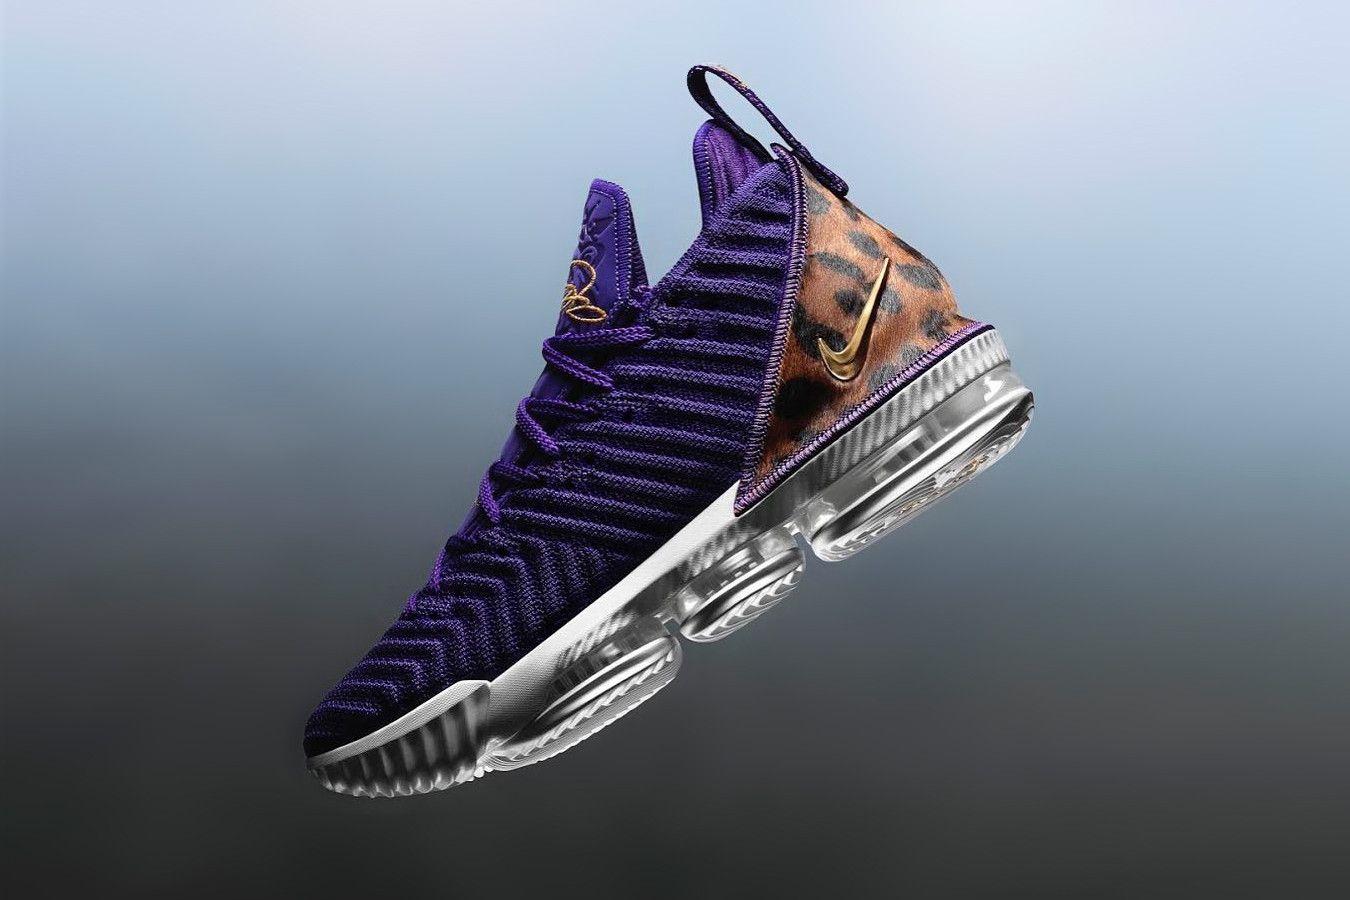 378e49b60ce LeBron James Debuts Nike LeBron 16